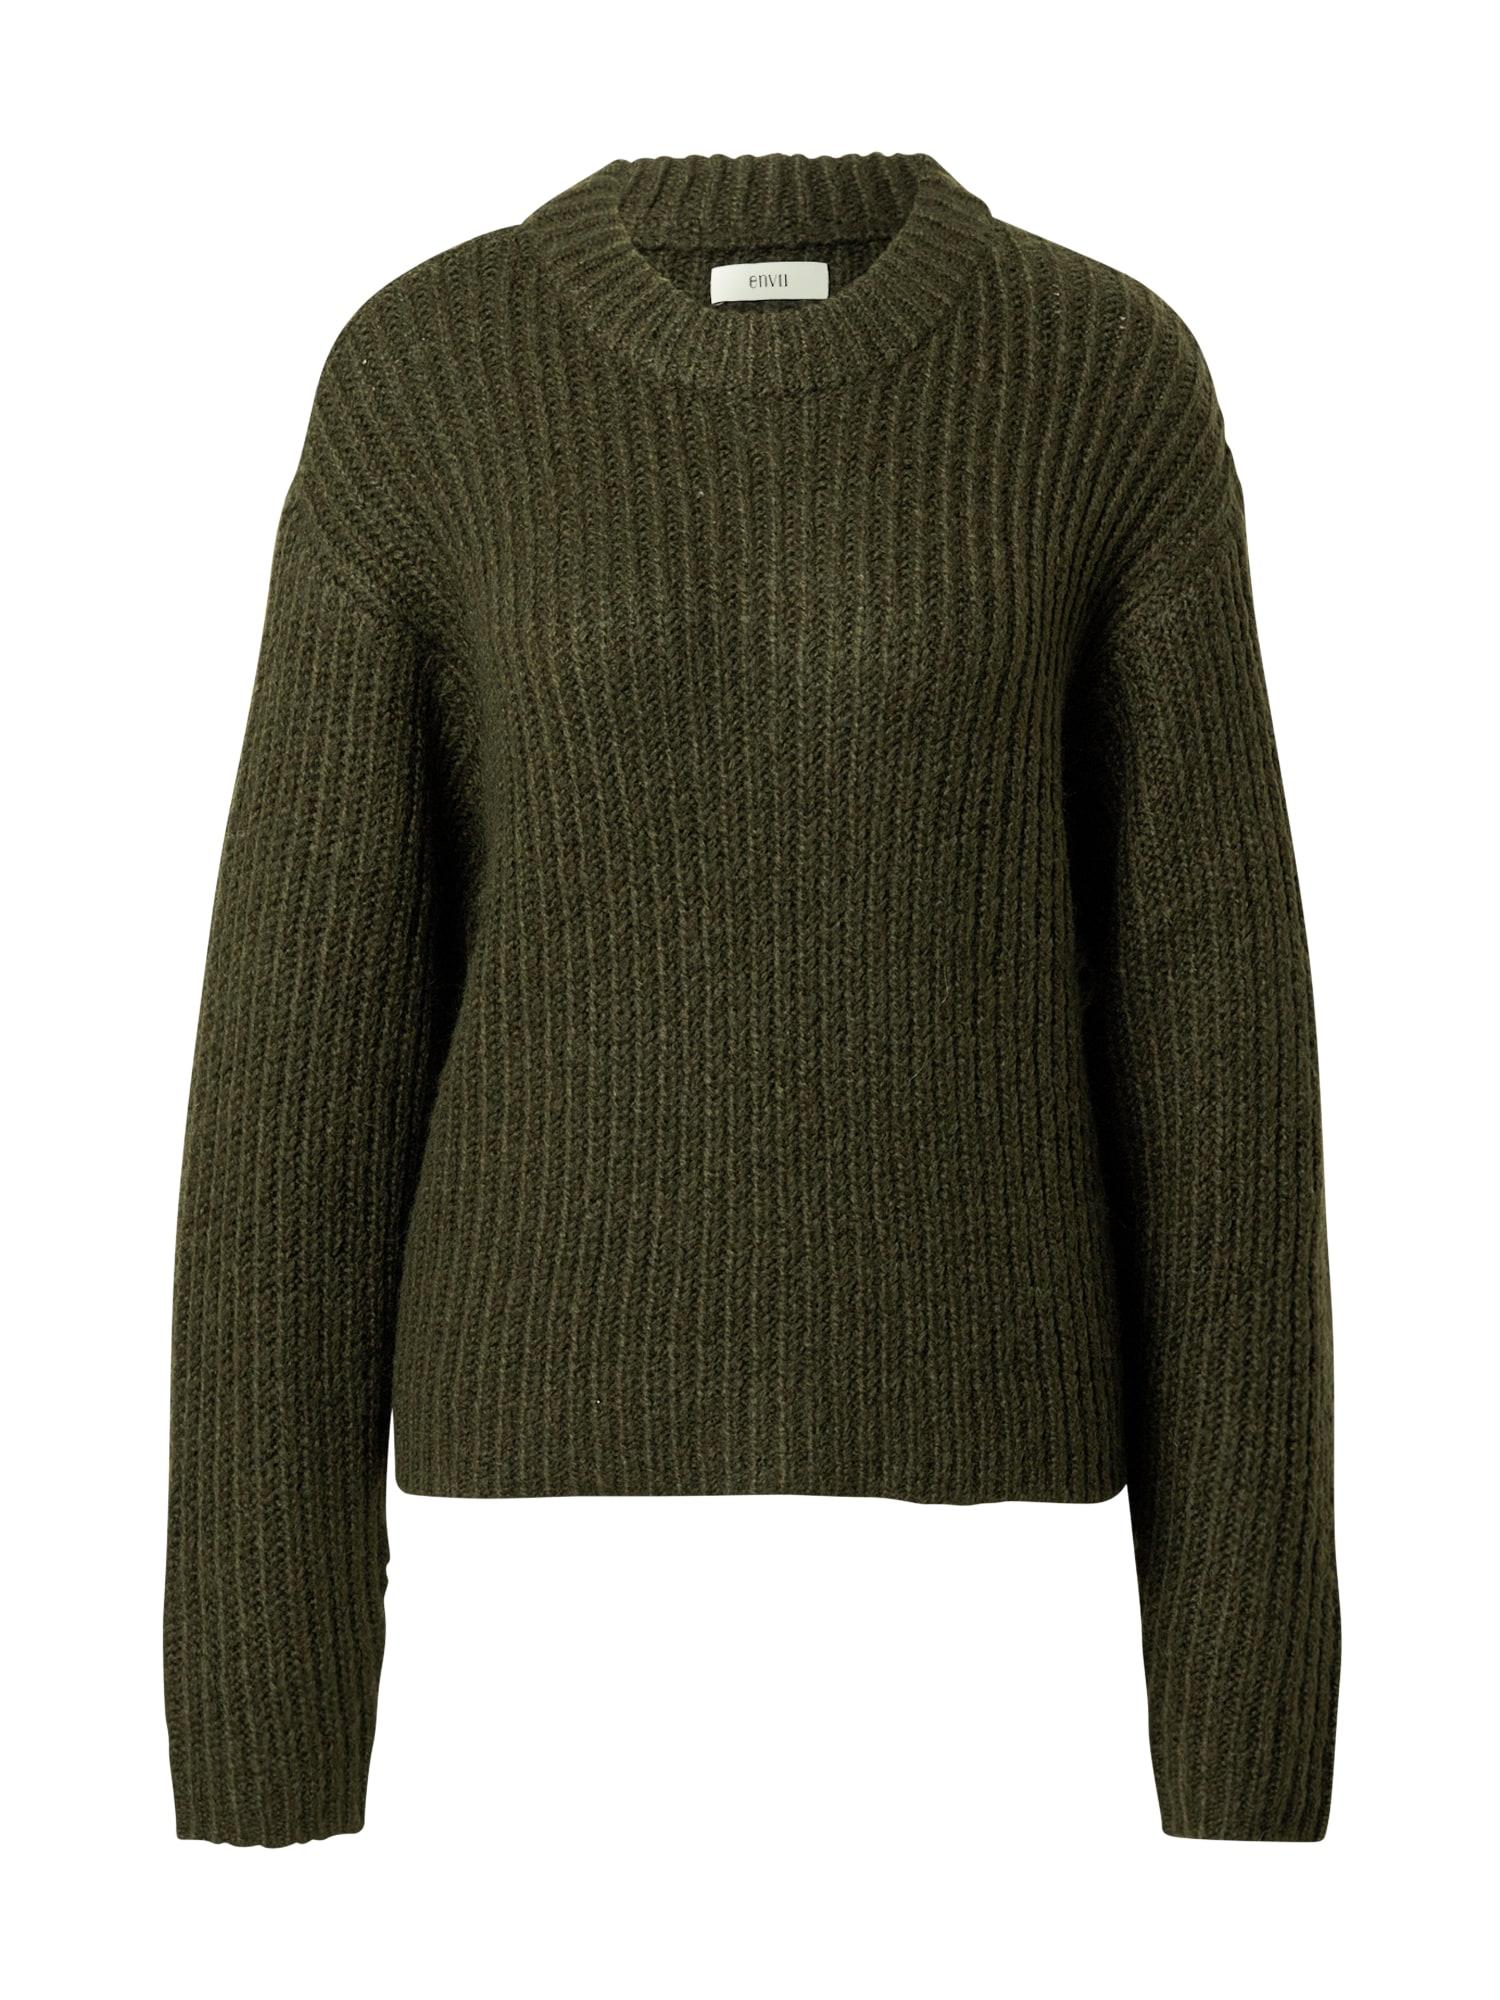 Envii Megztinis tamsiai žalia